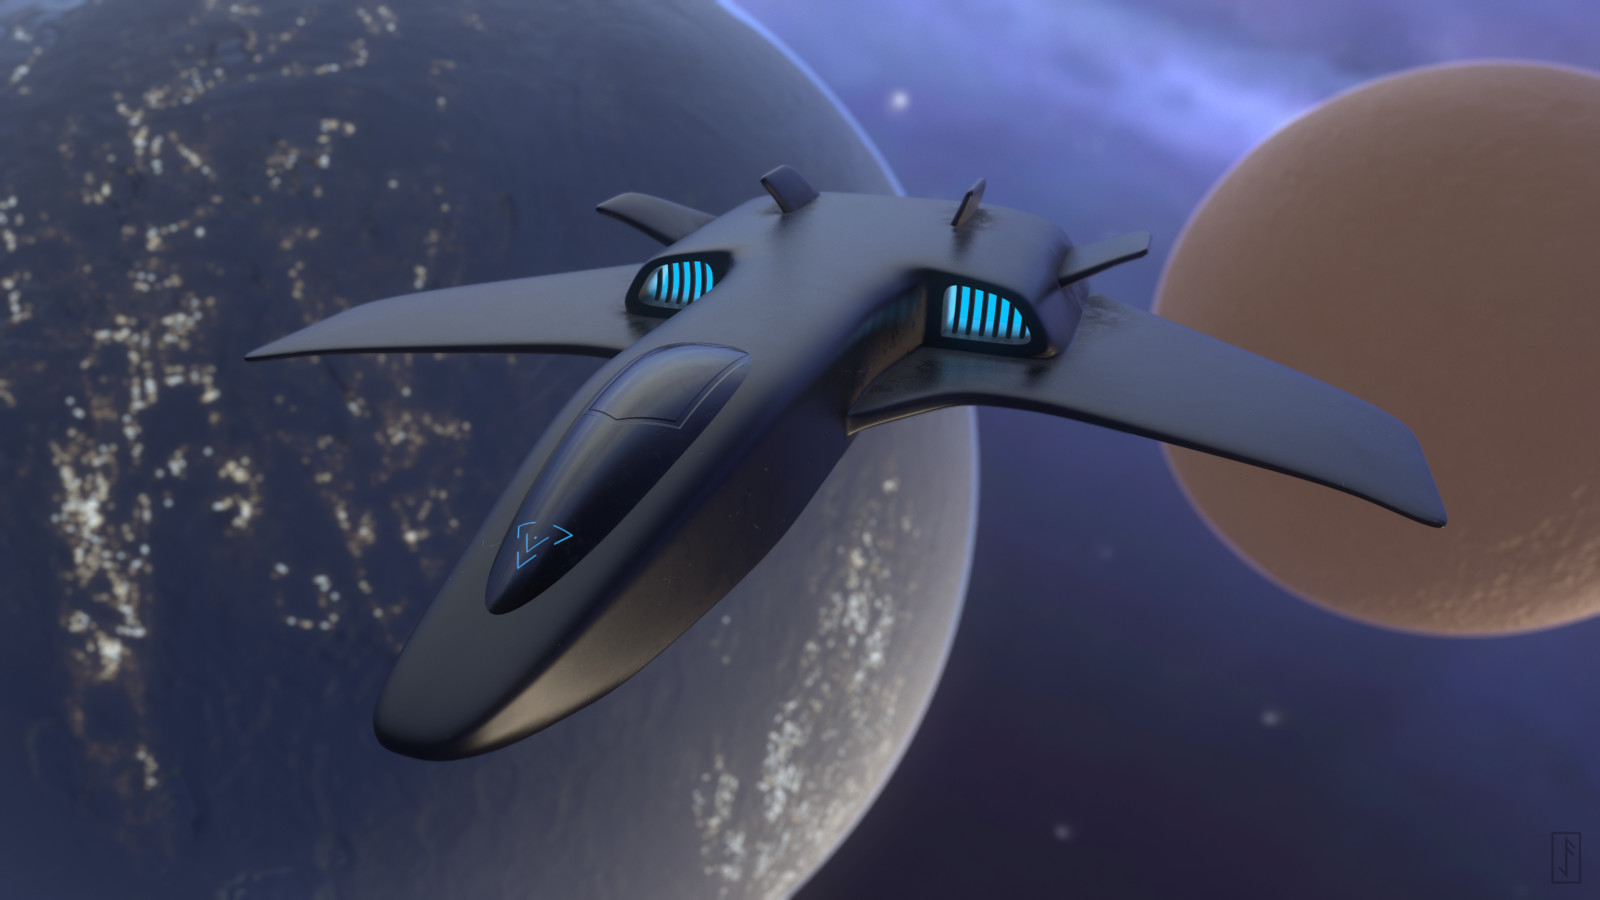 Starfighter Drone